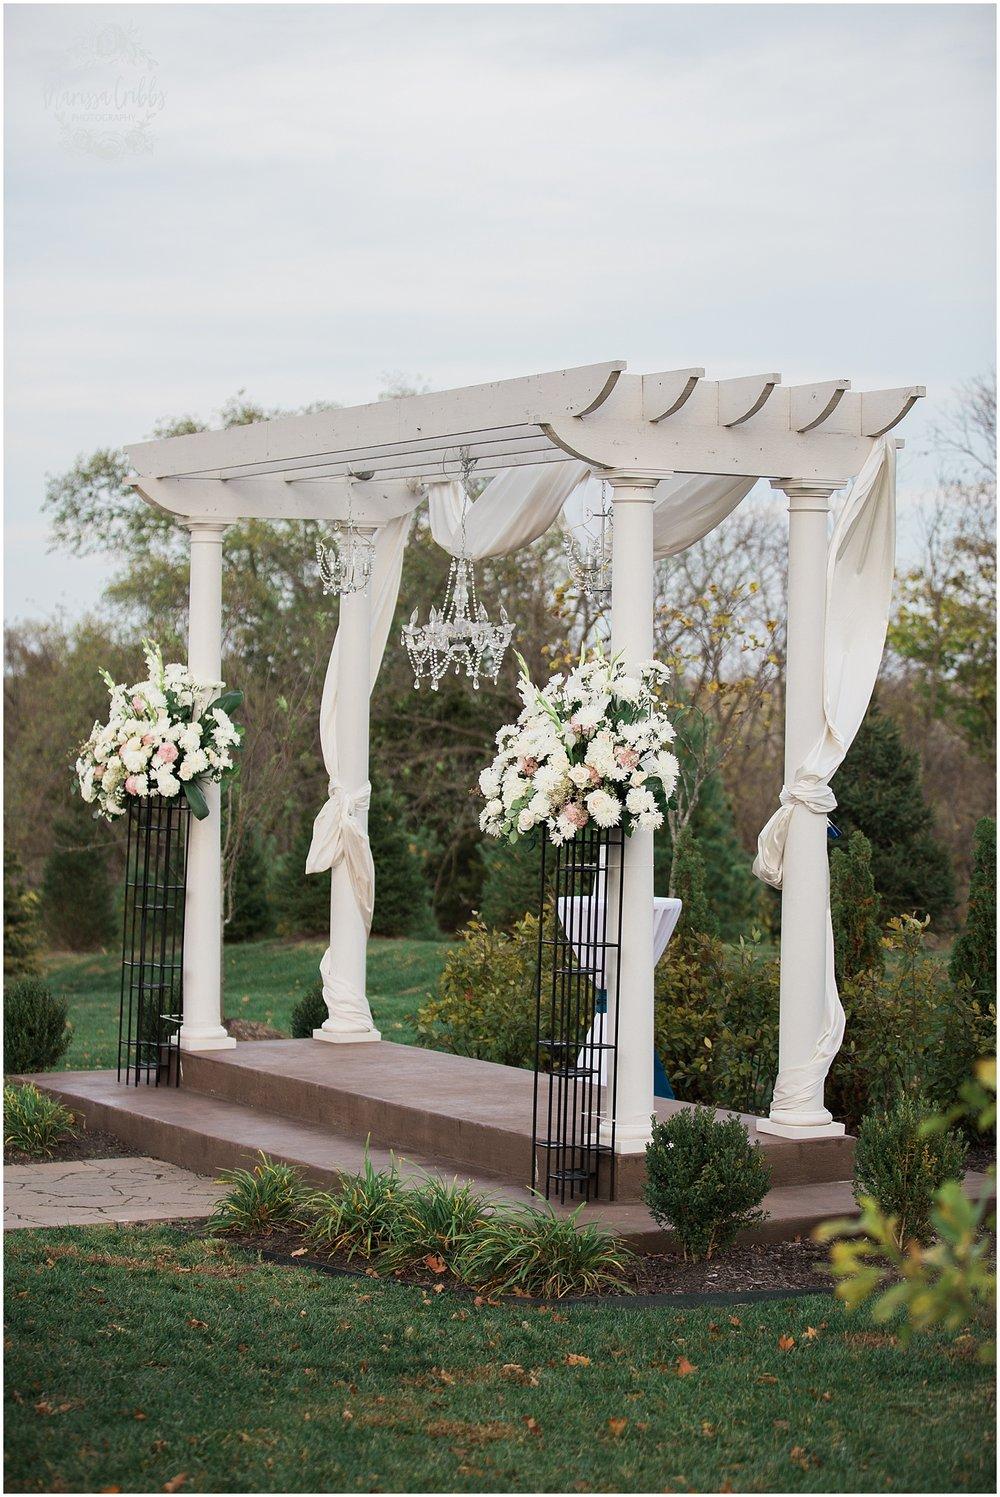 Alex+&+Amie+_+Eighteen+Ninety+Event+Space+_+Marissa+Cribbs+Photography+_+Kansas+City+Perfect+Wedding+Guide_1329.jpg